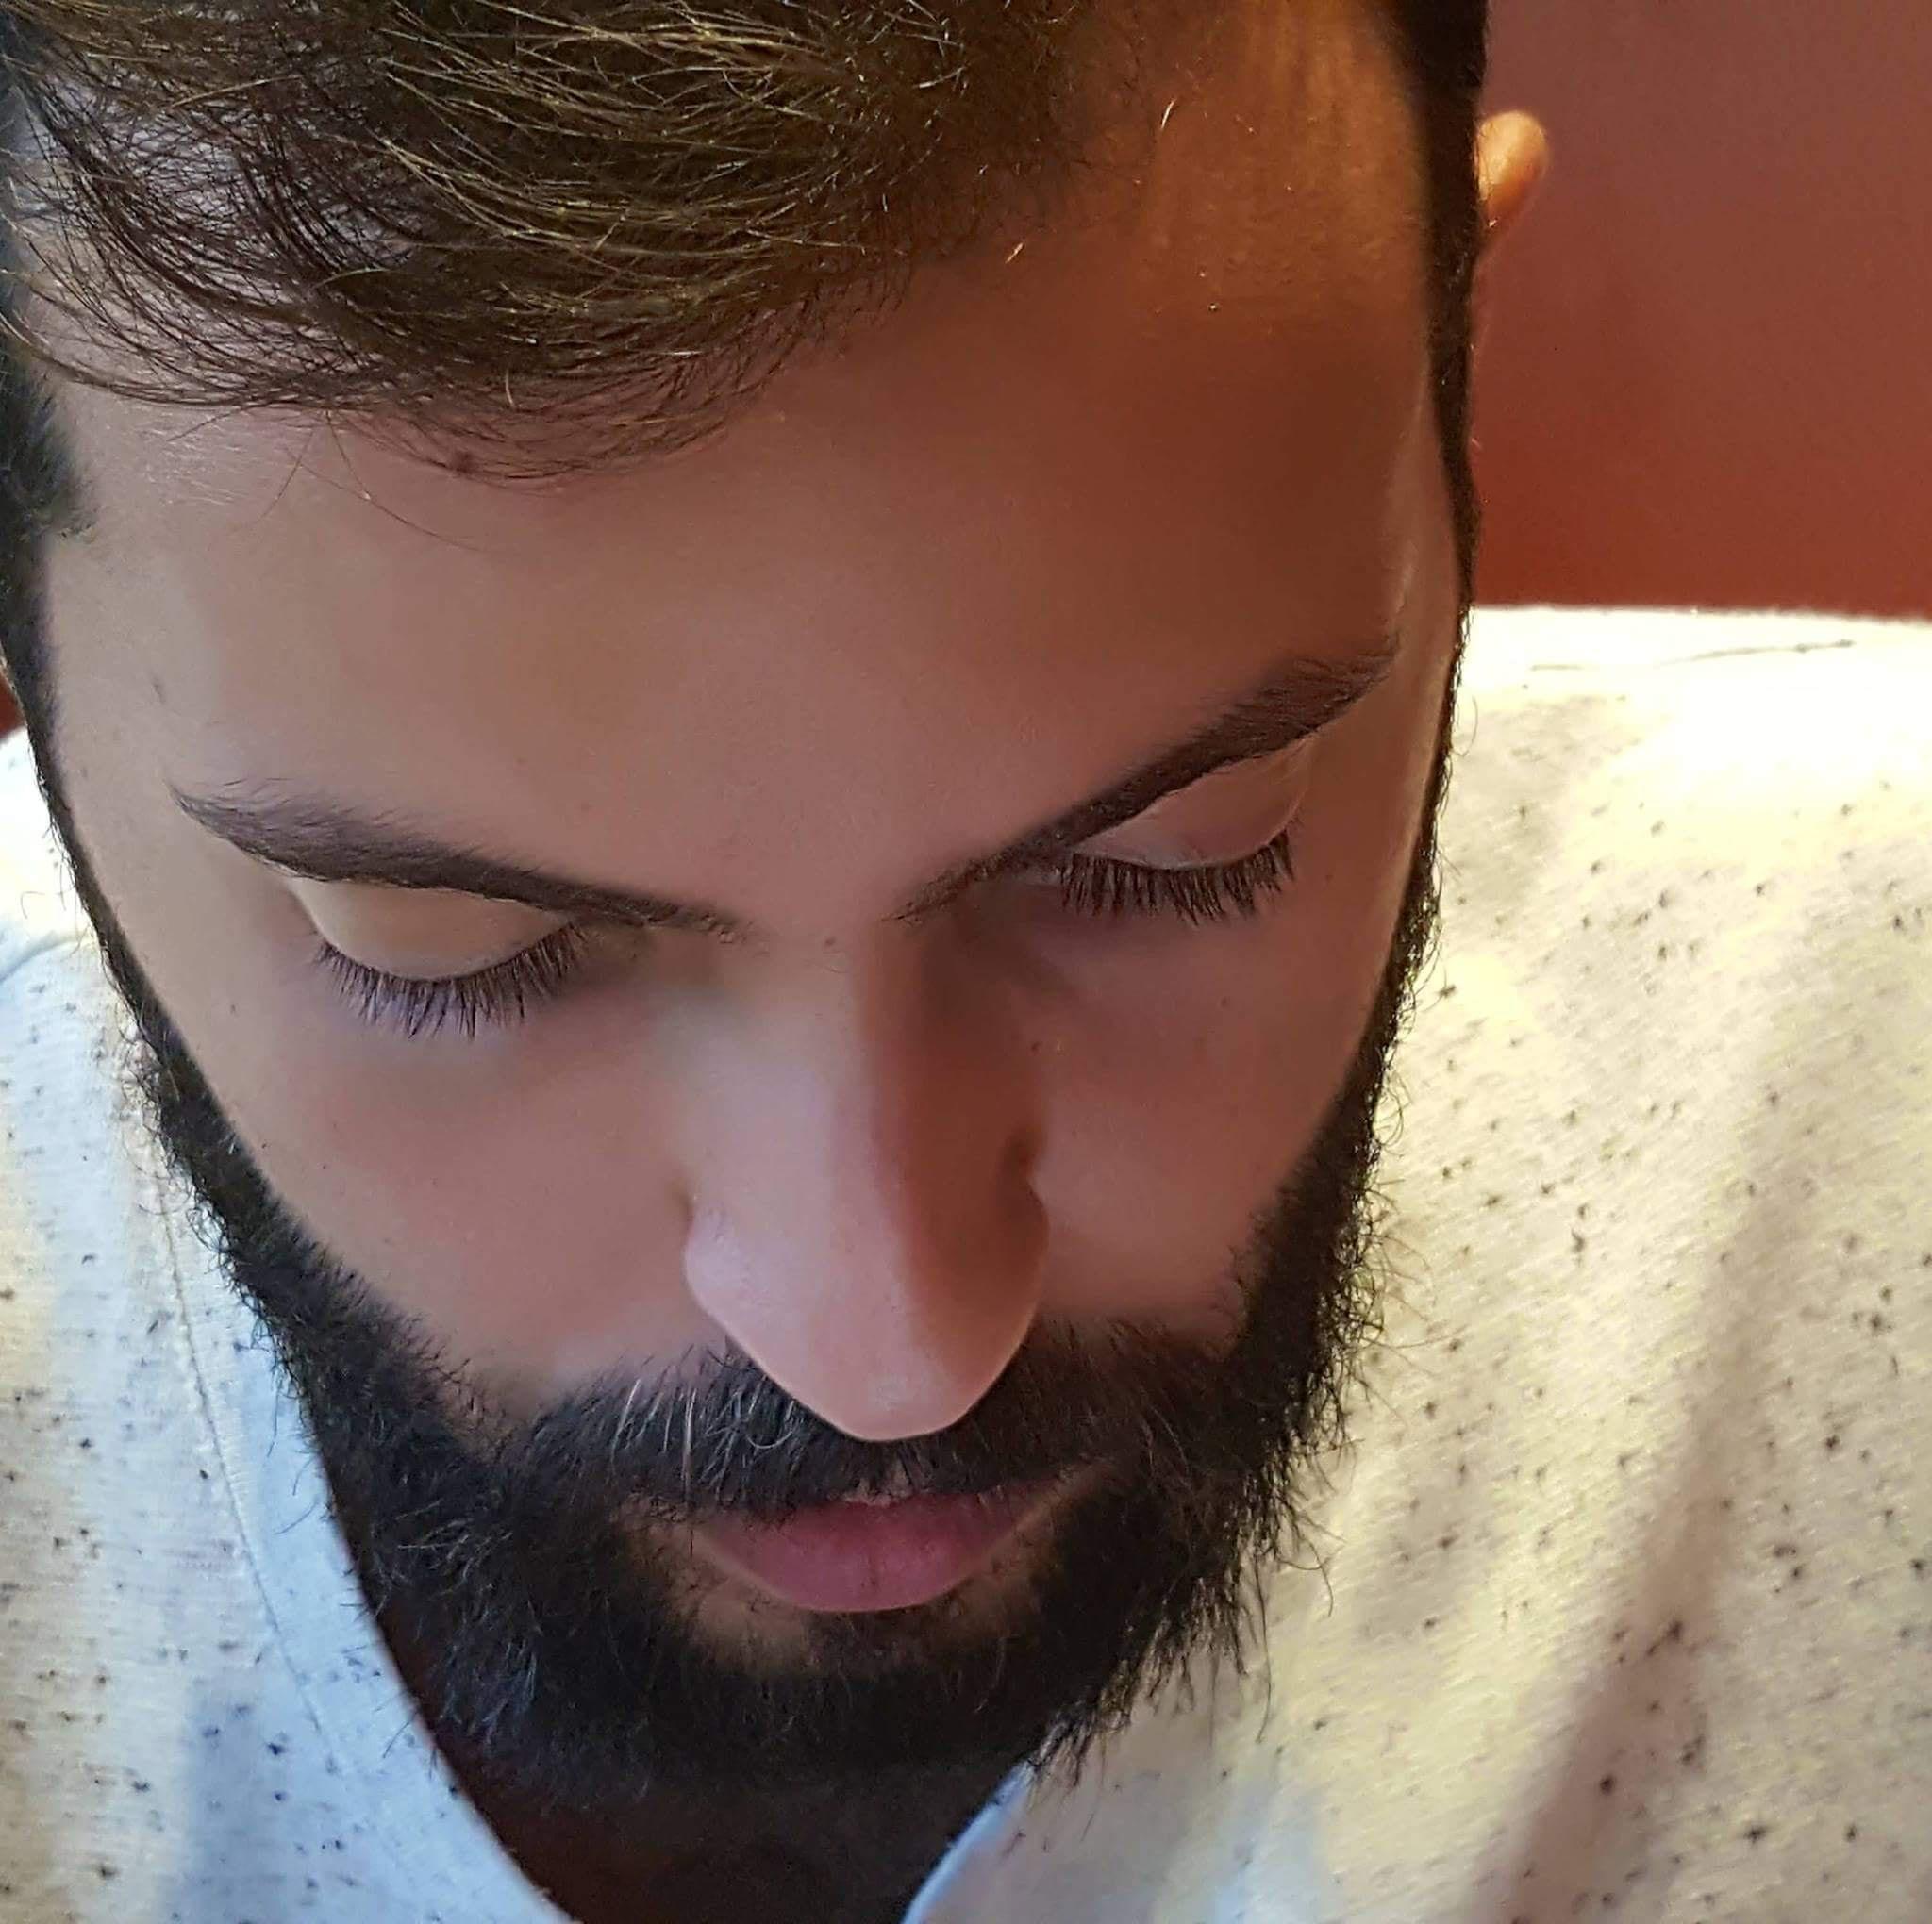 Go to mnyar samir's profile